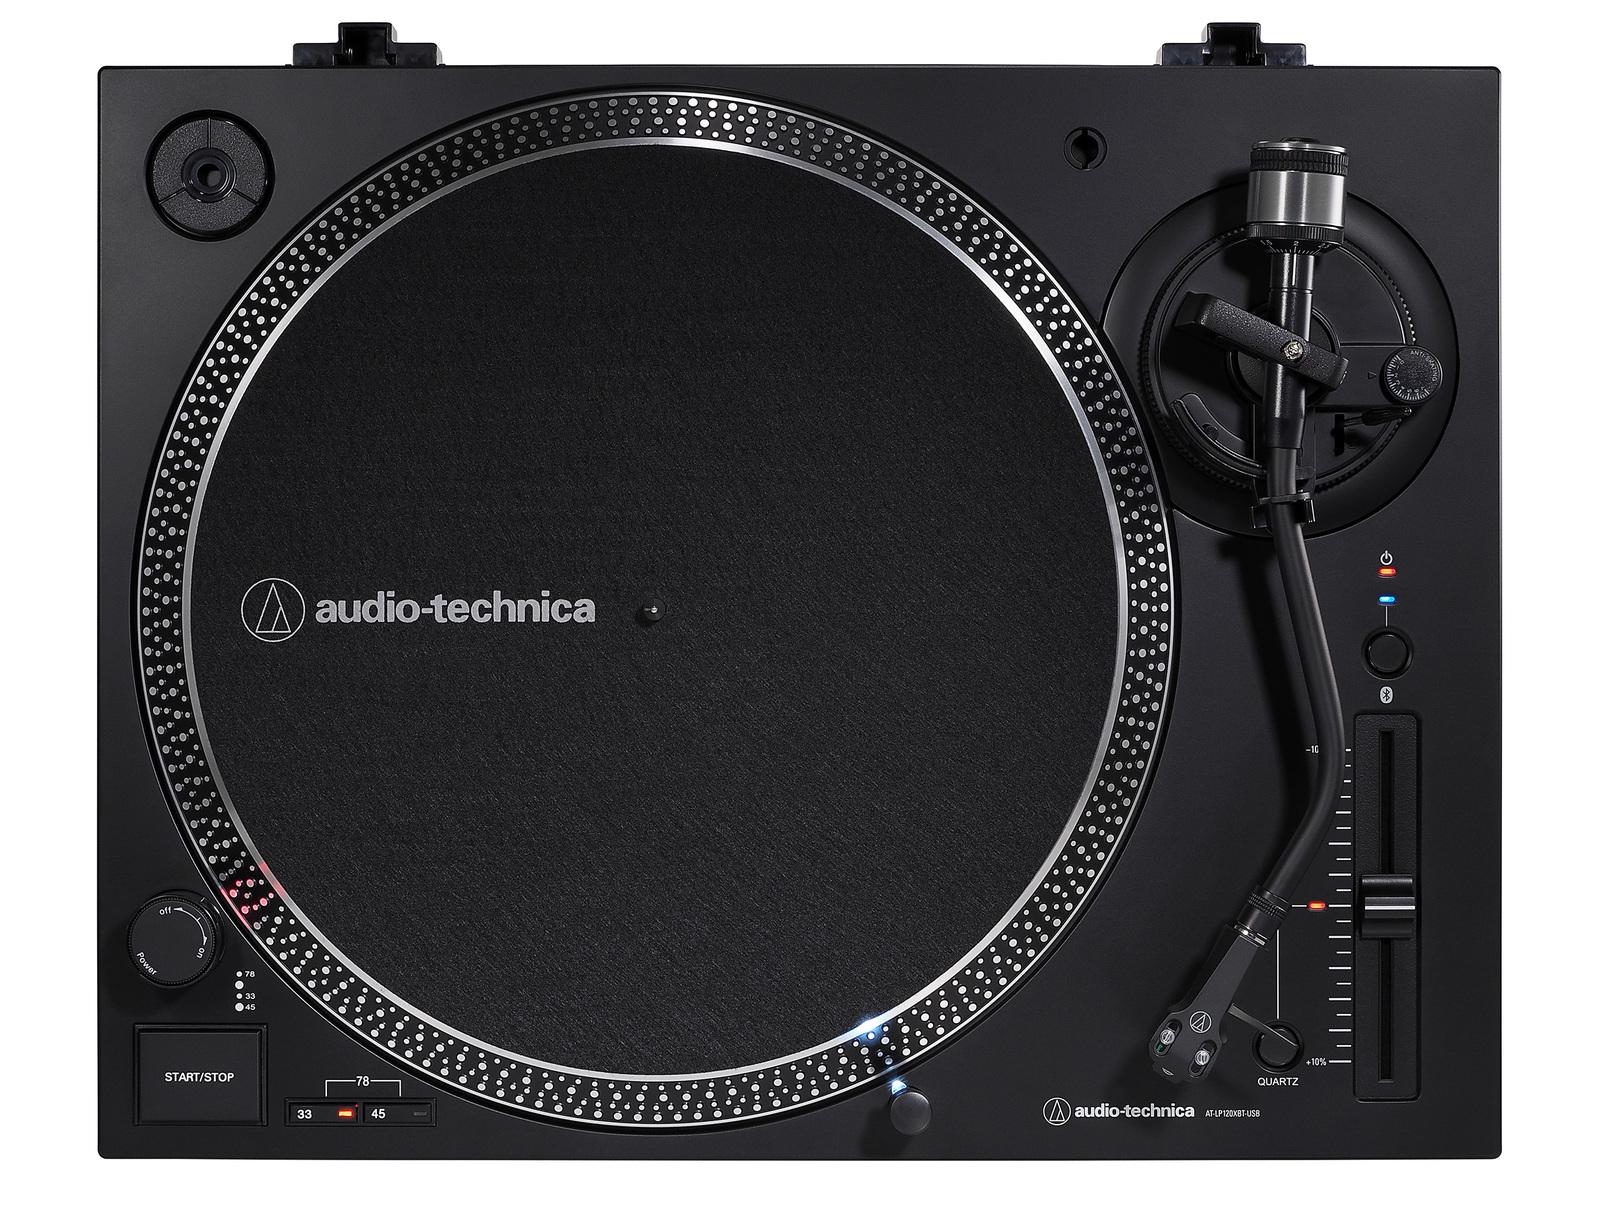 Audio Technica - Direct Drive Turntable image